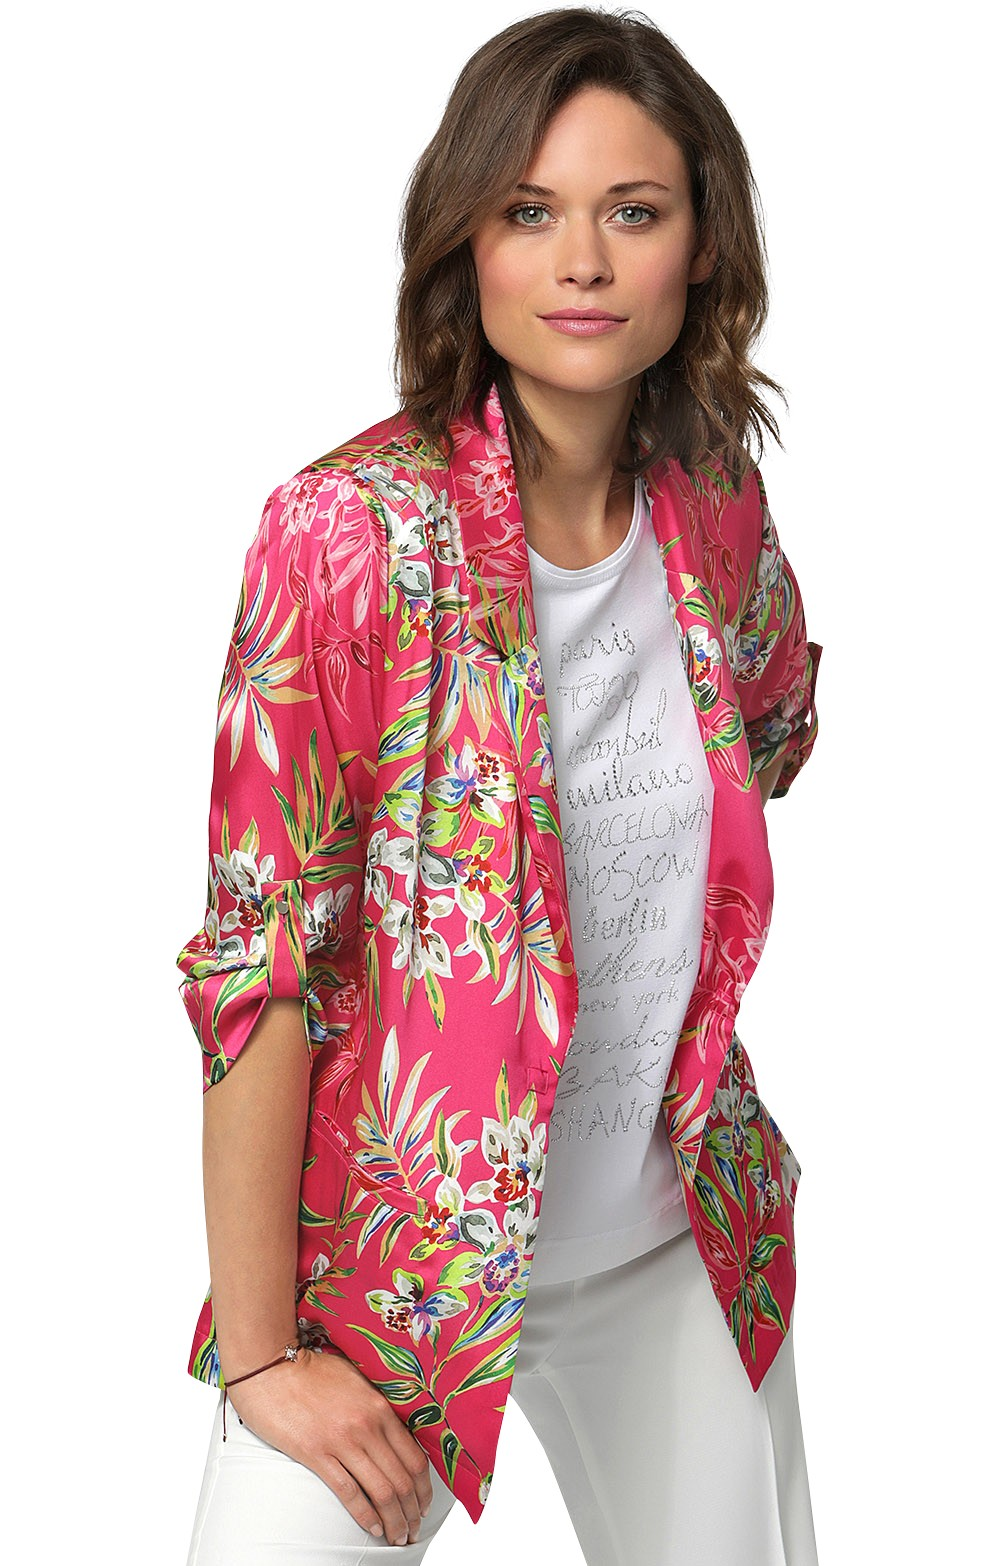 874fd3975c203a Ladies Erfo Print Jacket - House of Bruar